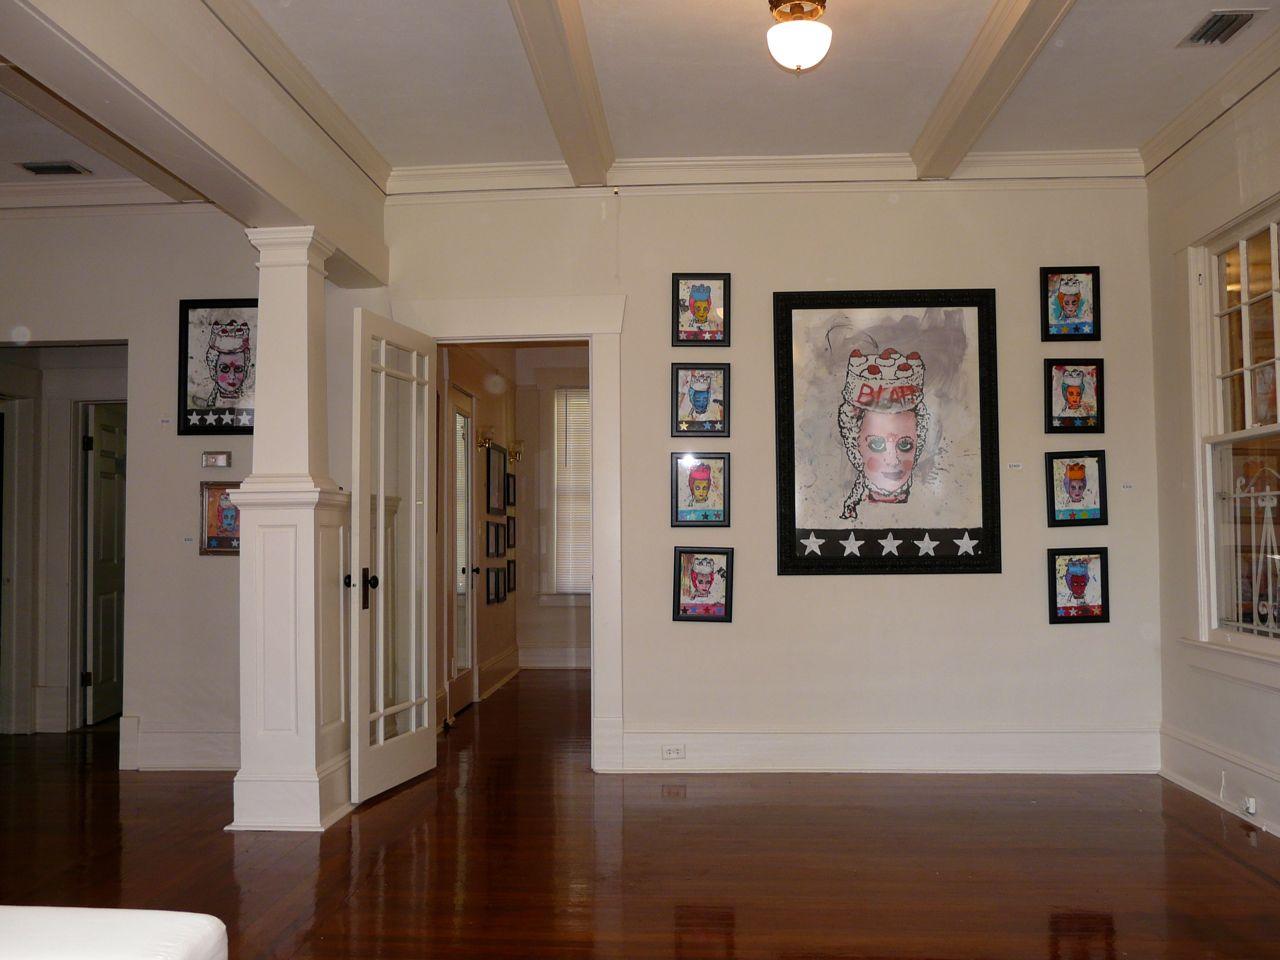 versus gallery interior.jpg